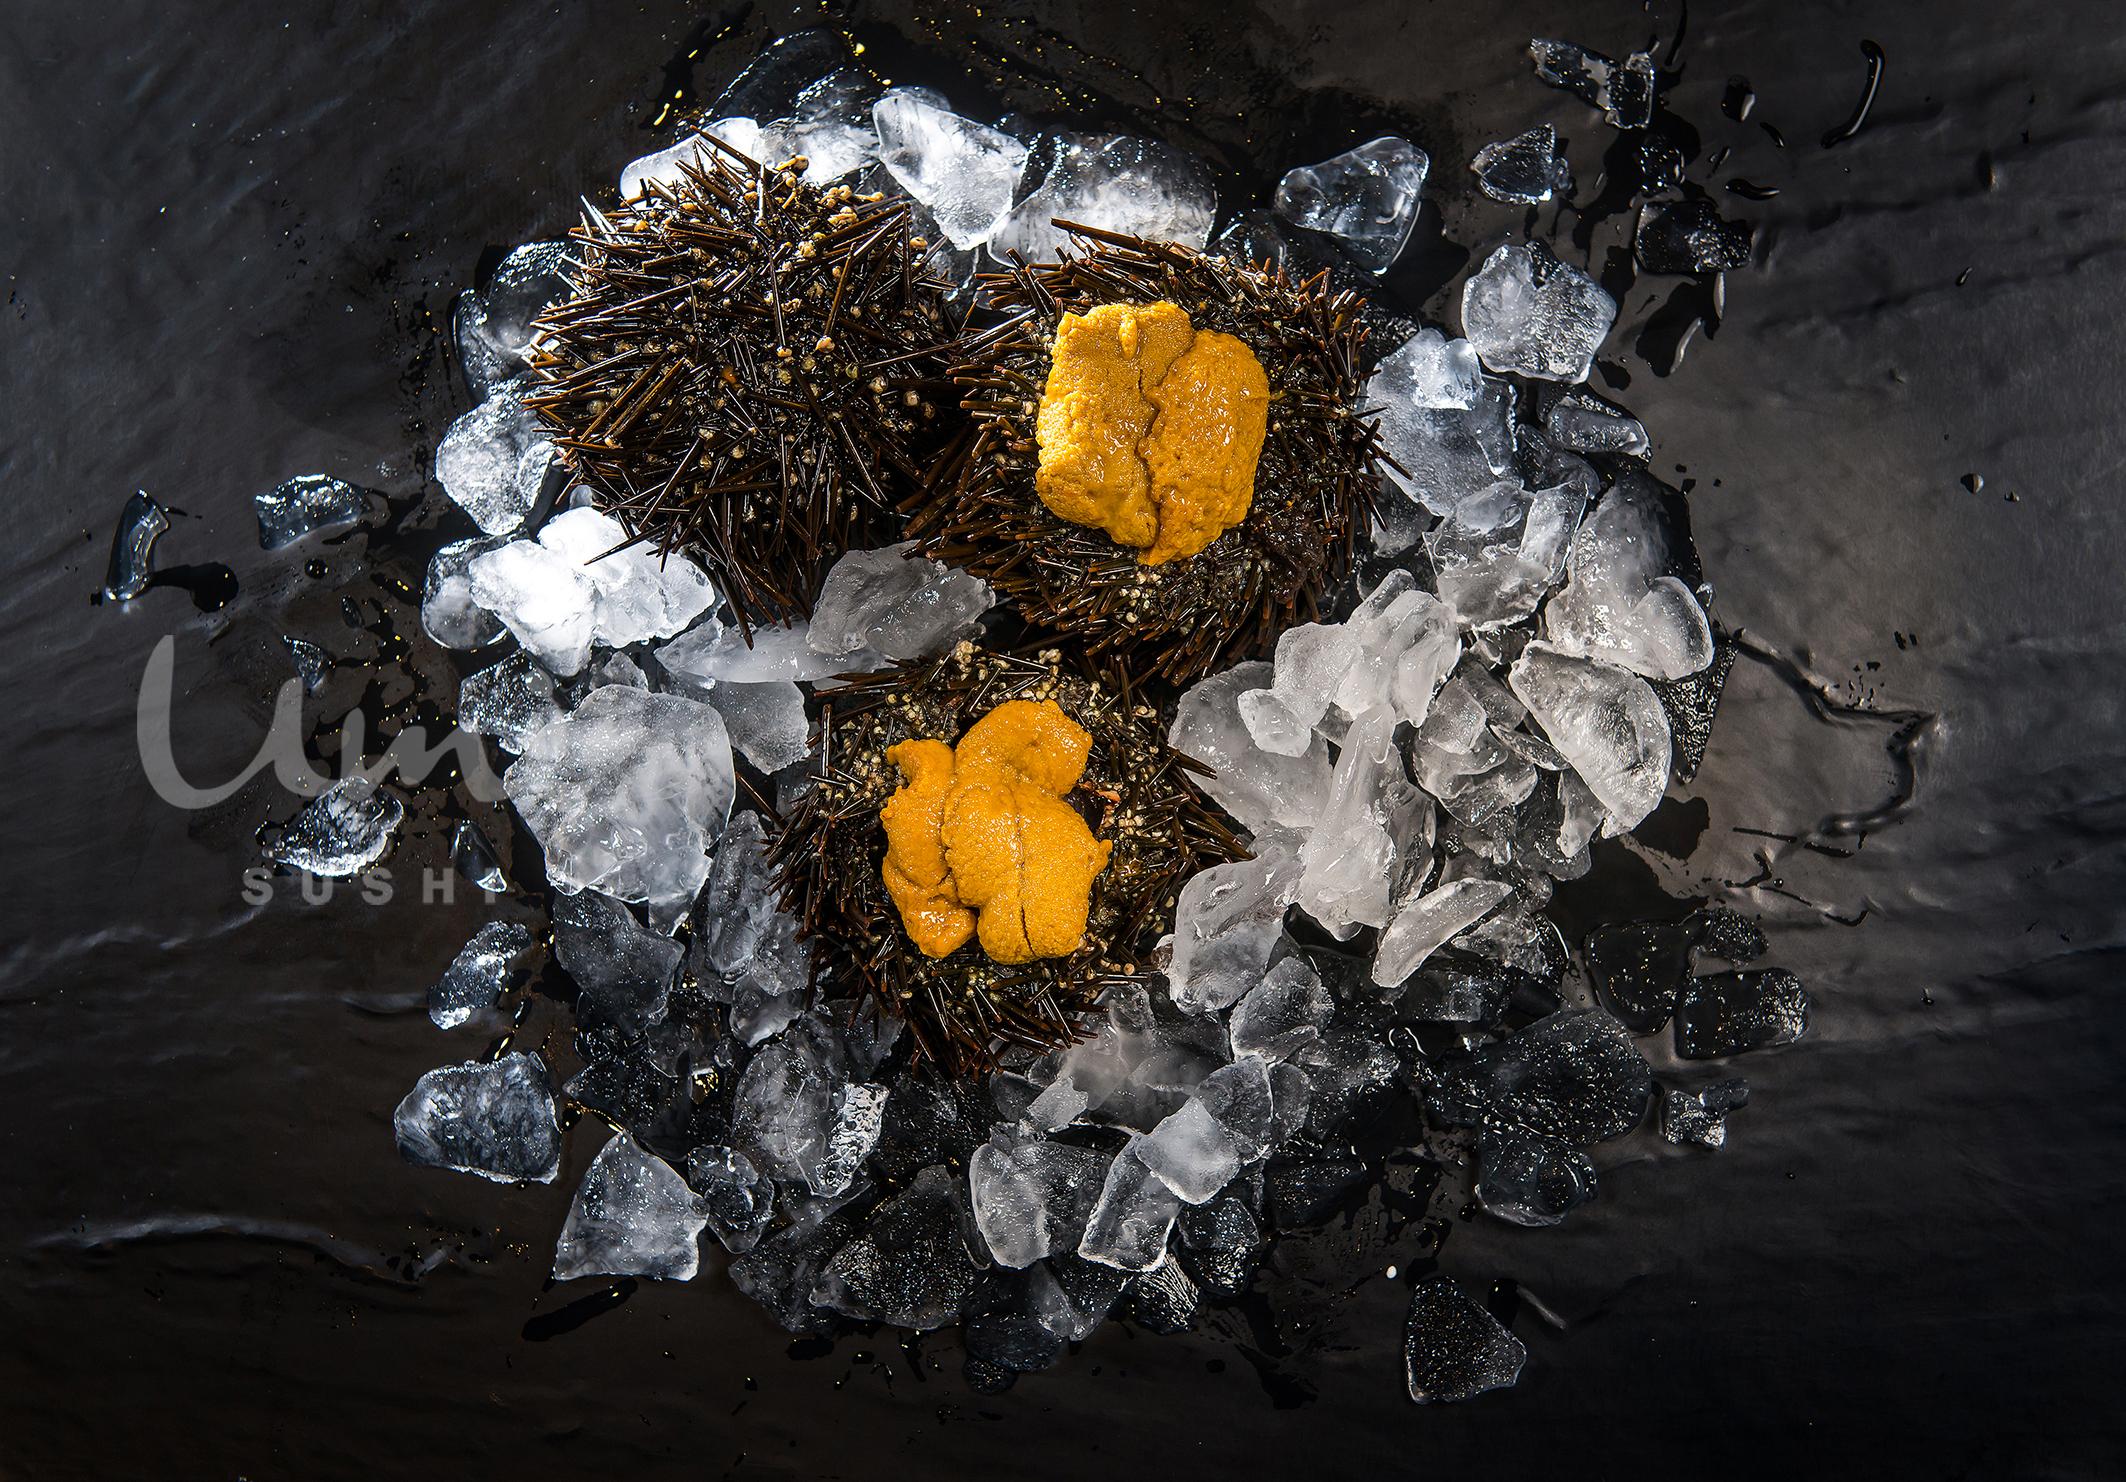 Fresh Live Uni (Sea Urchin)